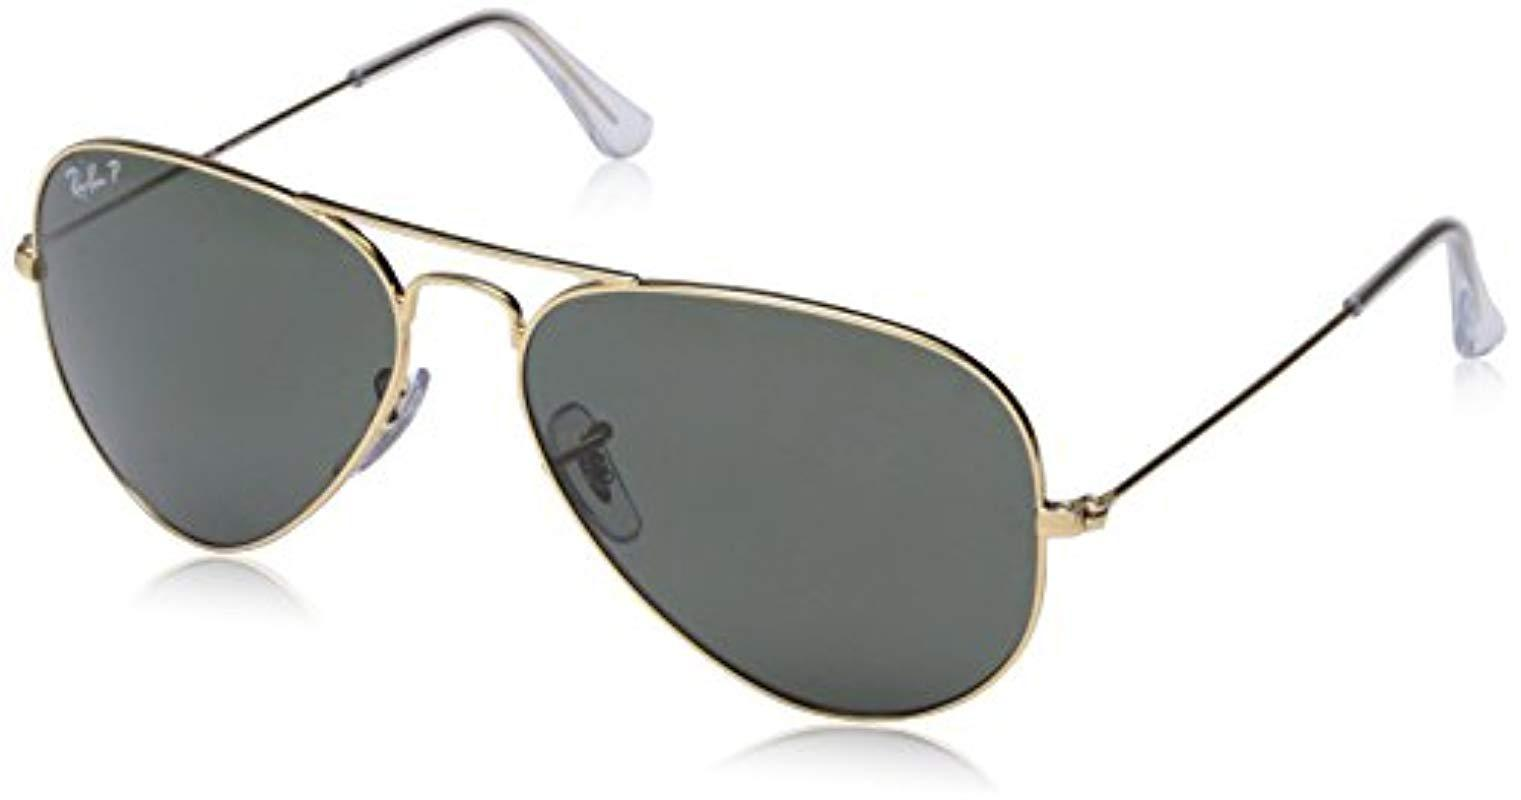 Ray-Ban. Women s Metallic Classic Aviator Sunglasses Arista Gold Crystal  Green Polarised ... 1af93ab9be